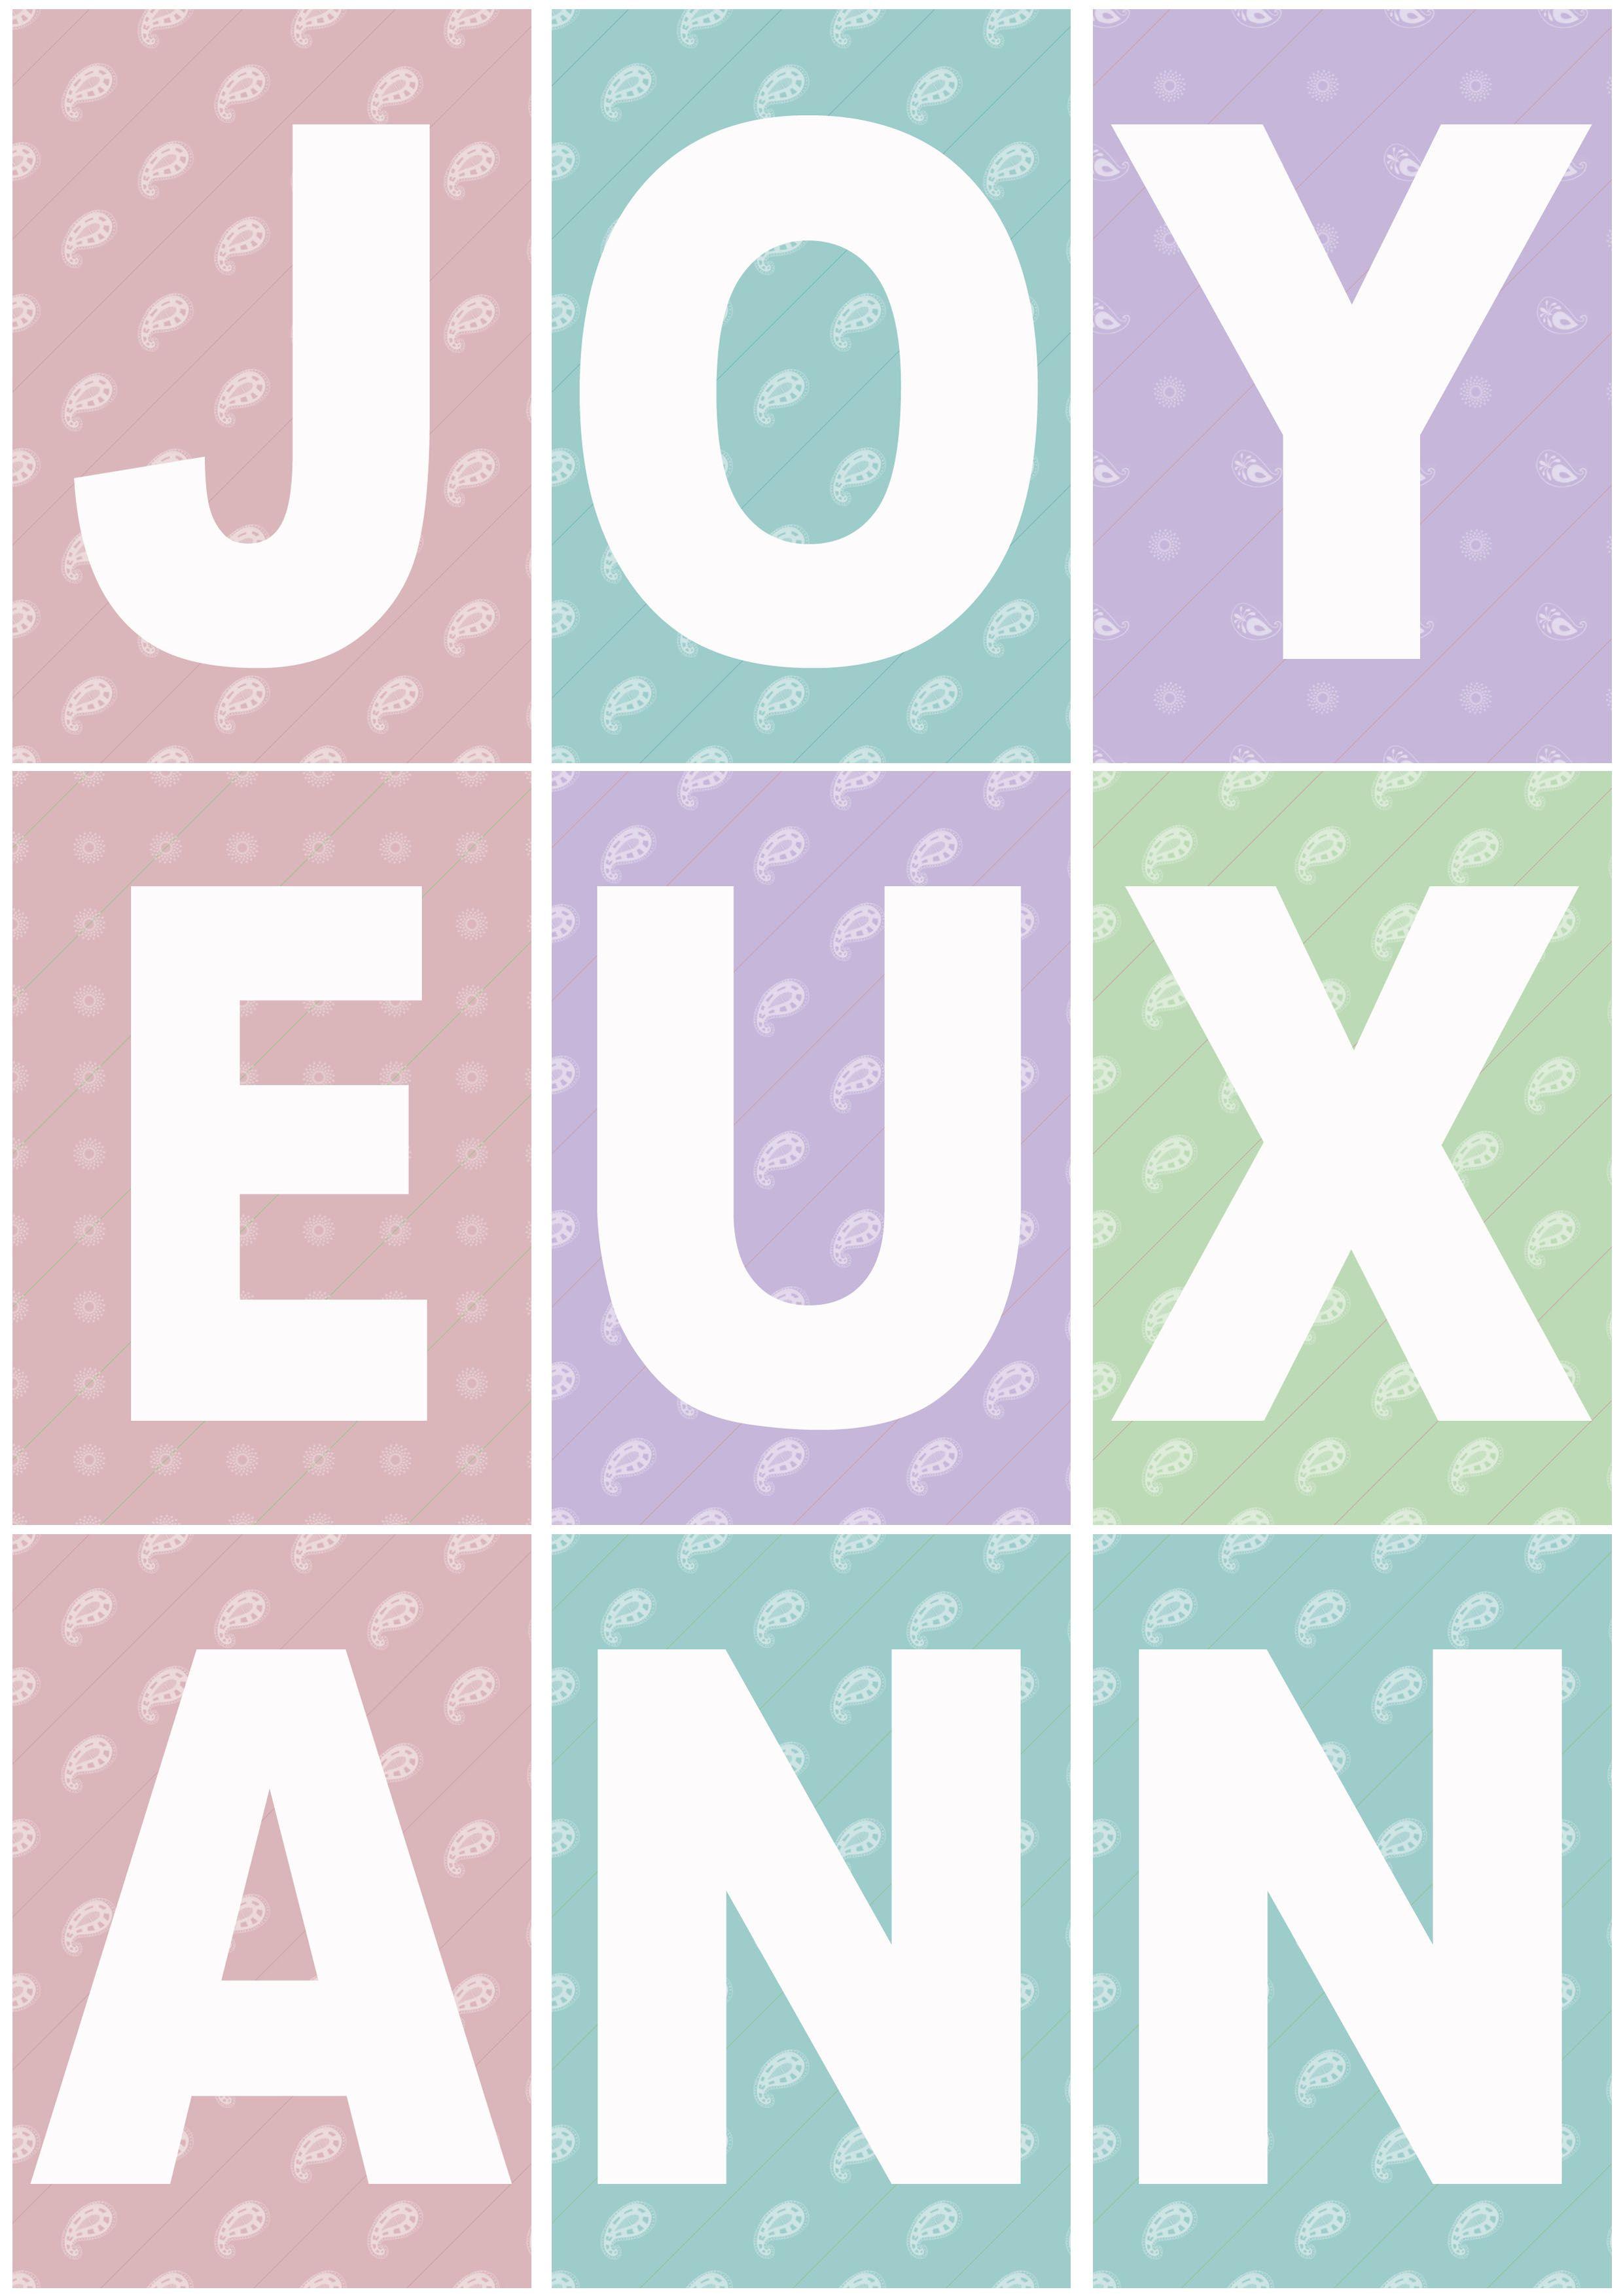 Favori Joyeuxvignette.jpg | ce1 | Pinterest | Anniversaires, Banderole  UO35